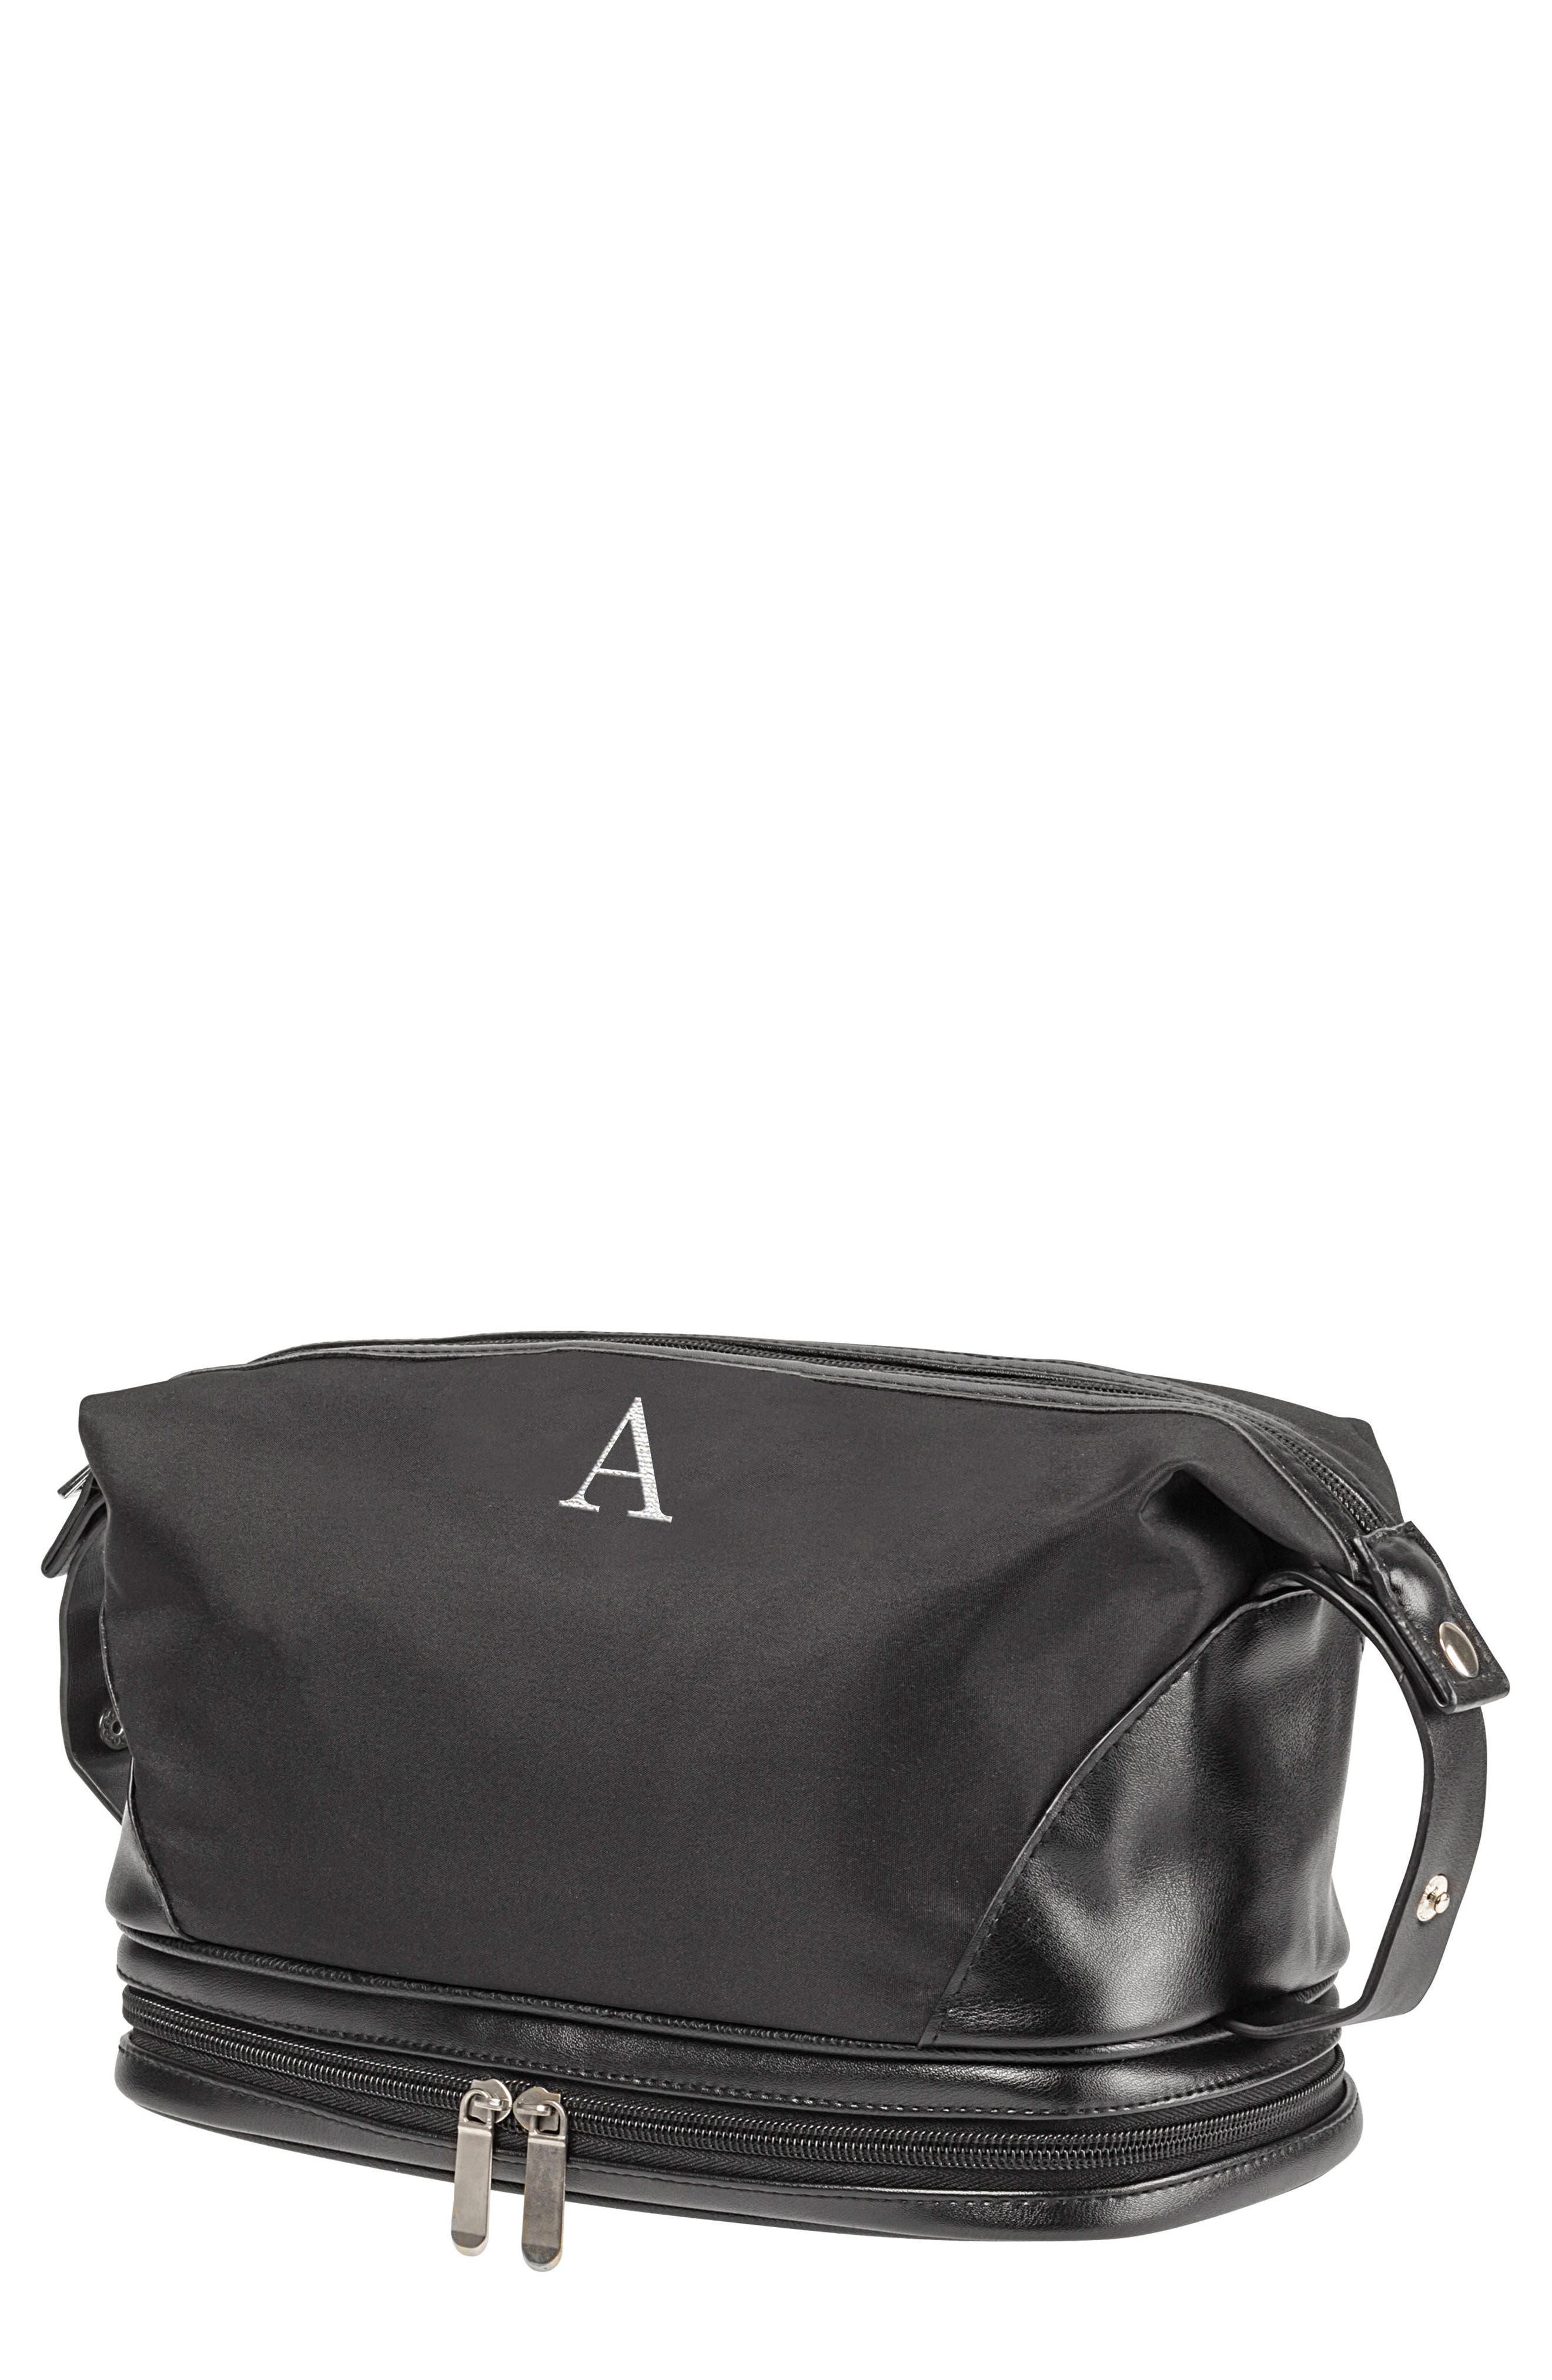 Monogram Toiletry Bag,                         Main,                         color, BLACK A